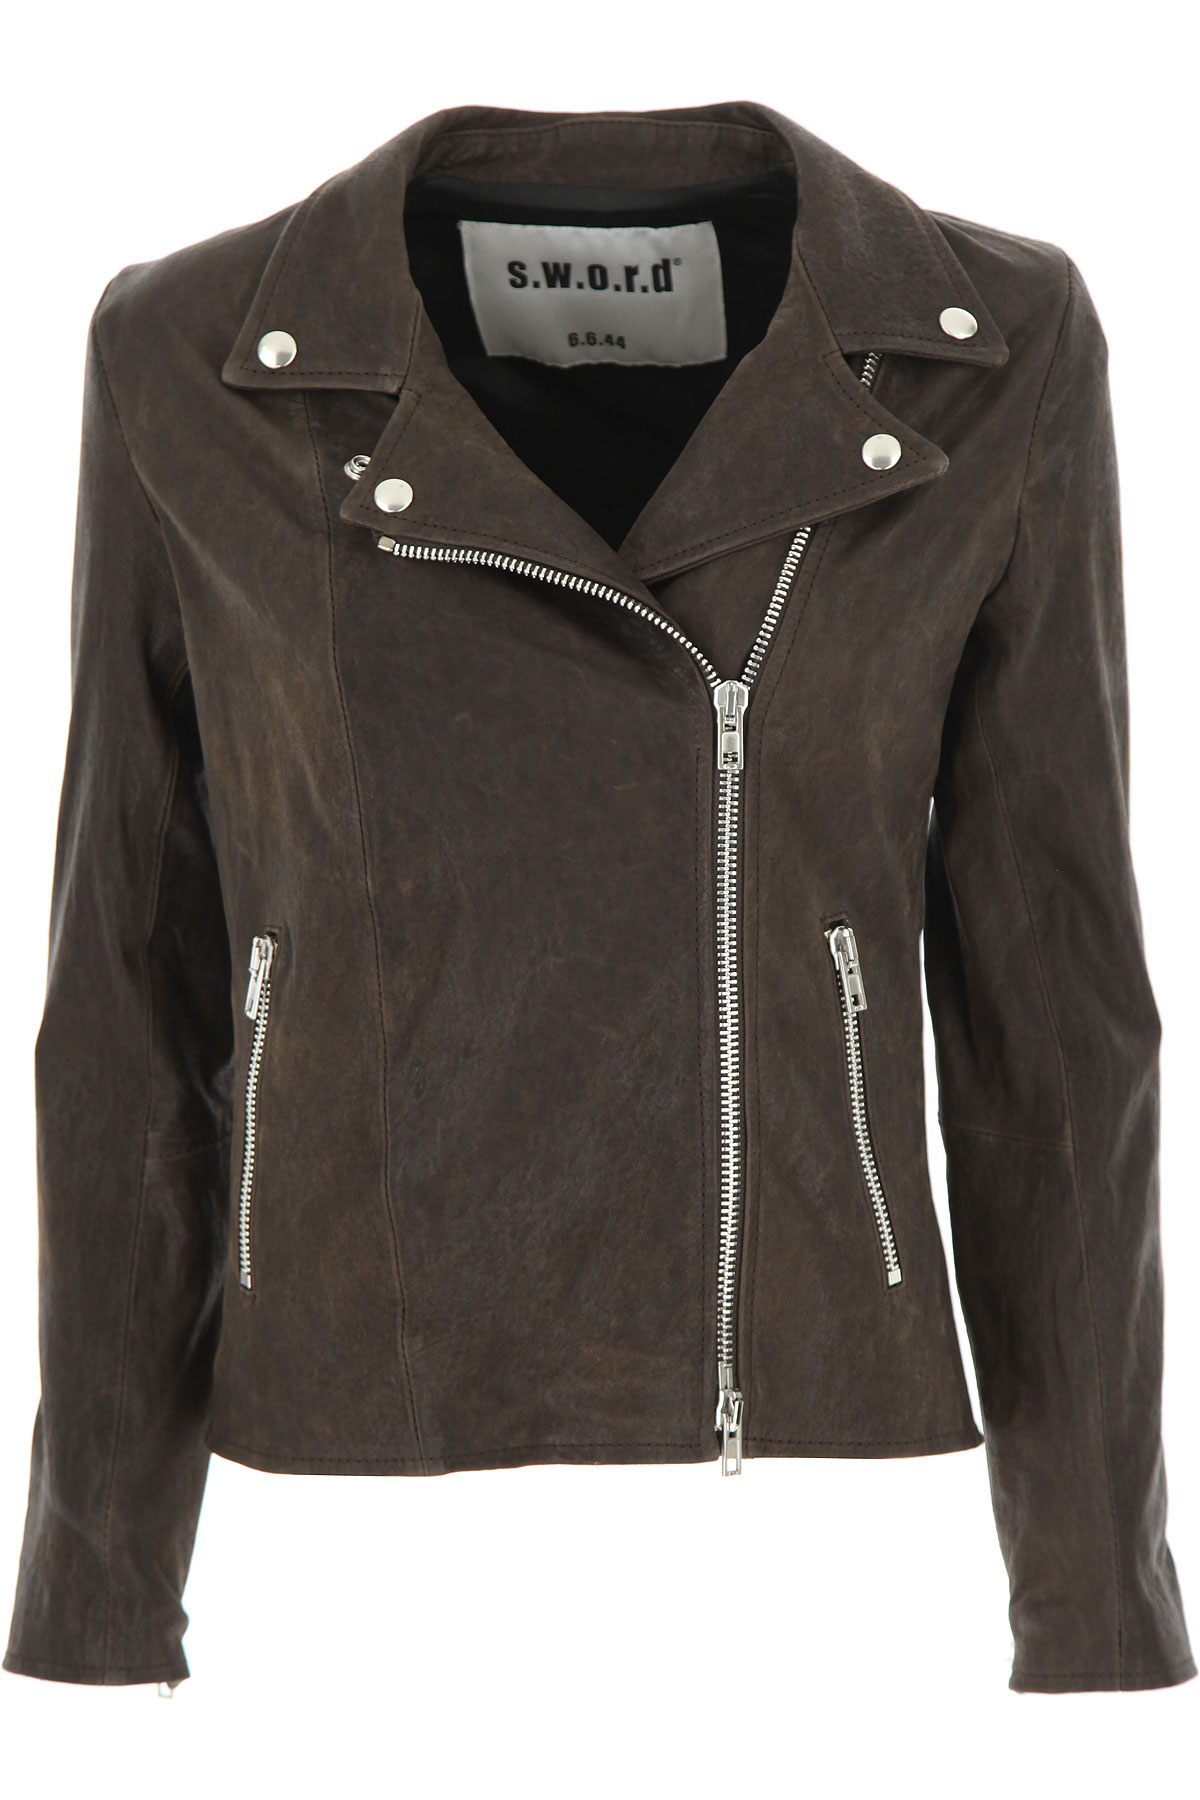 S.W.O.R.D Down Jacket for Women, Puffer Ski Jacket On Sale, Brown, Leather, 2019, FR 42 - IT 46 FR 44 - IT 48